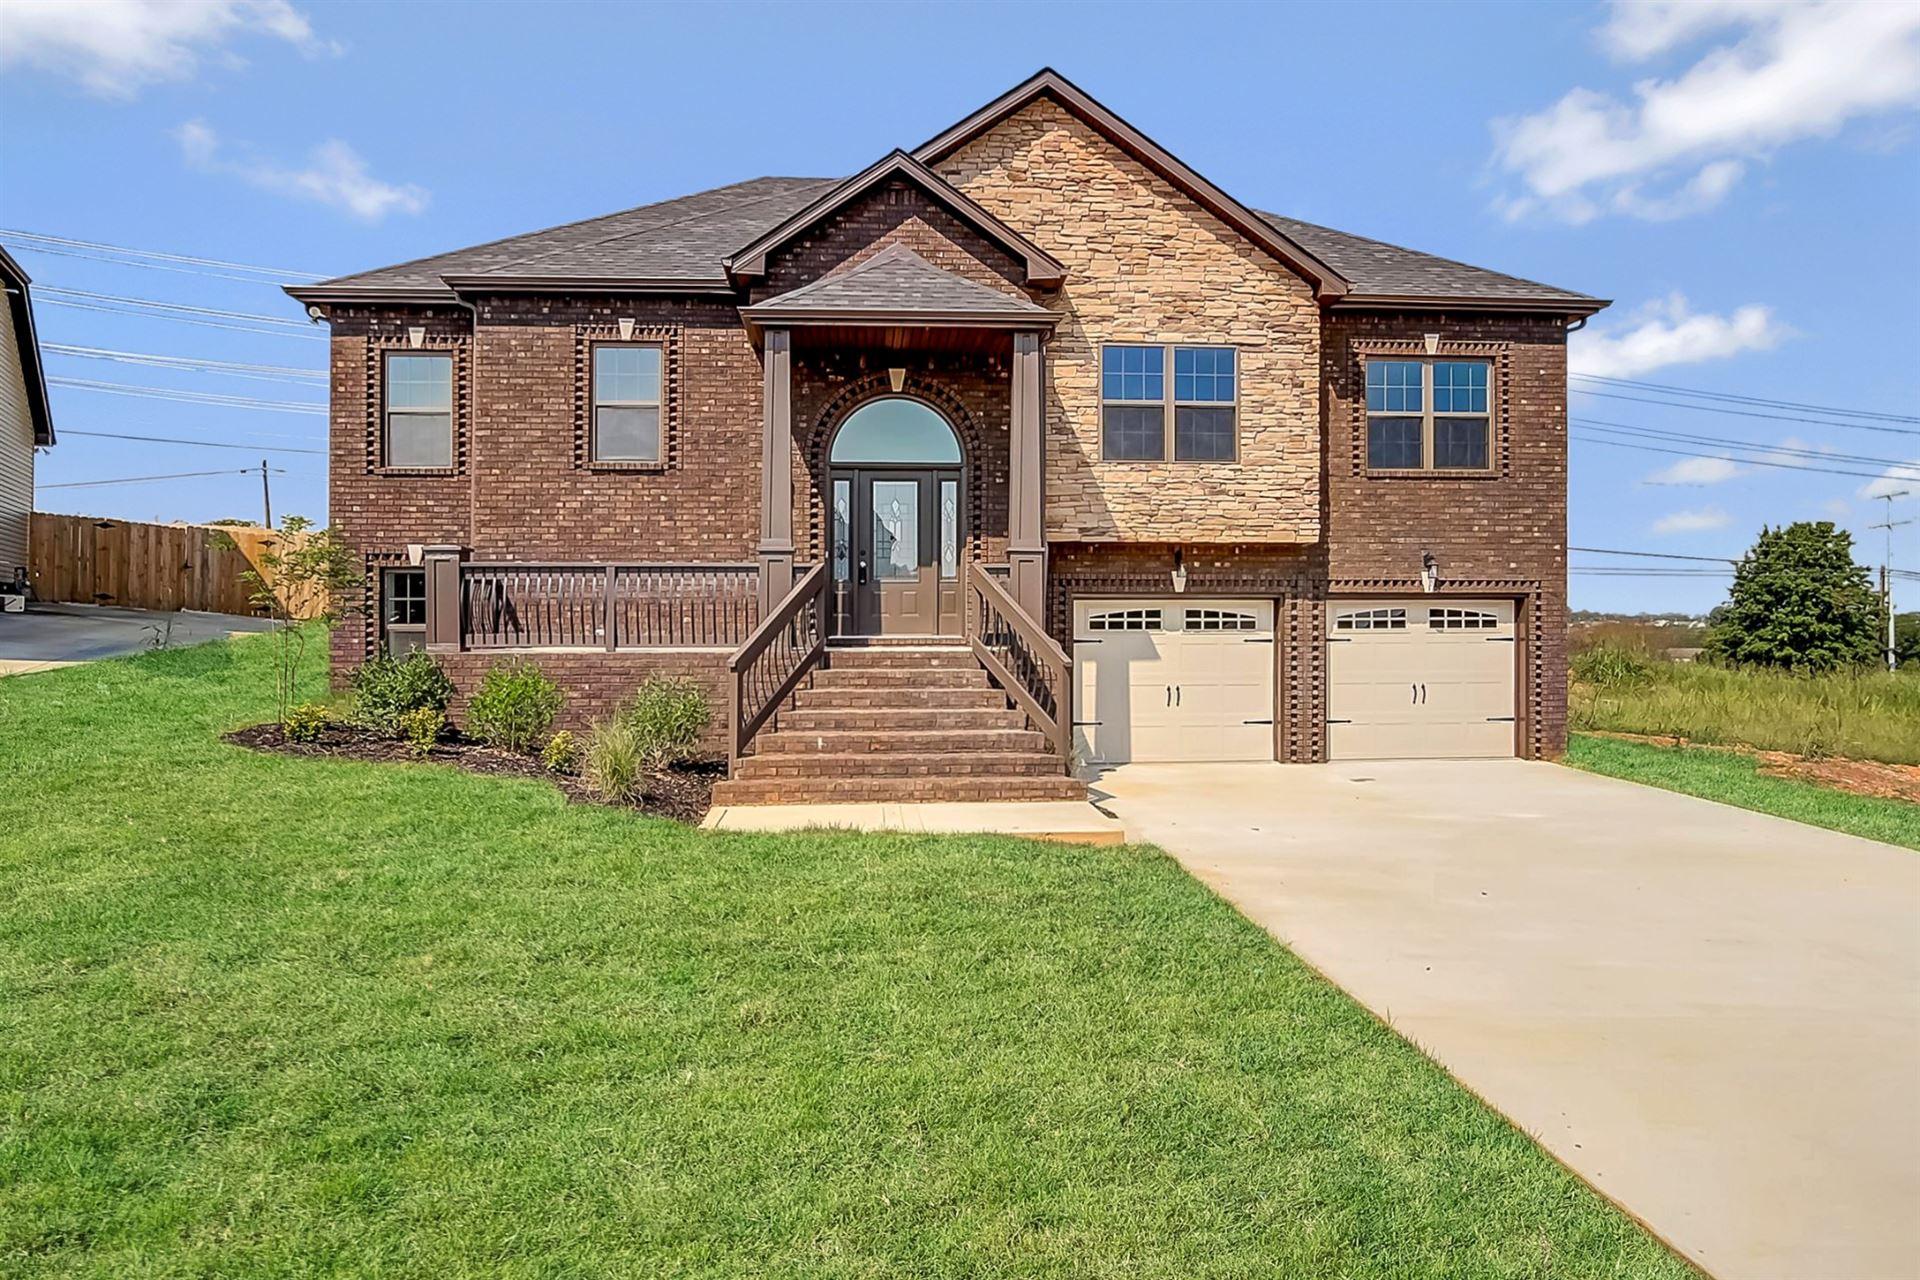 1316 Golden Eagle Way, Clarksville, TN 37040 - MLS#: 2188081